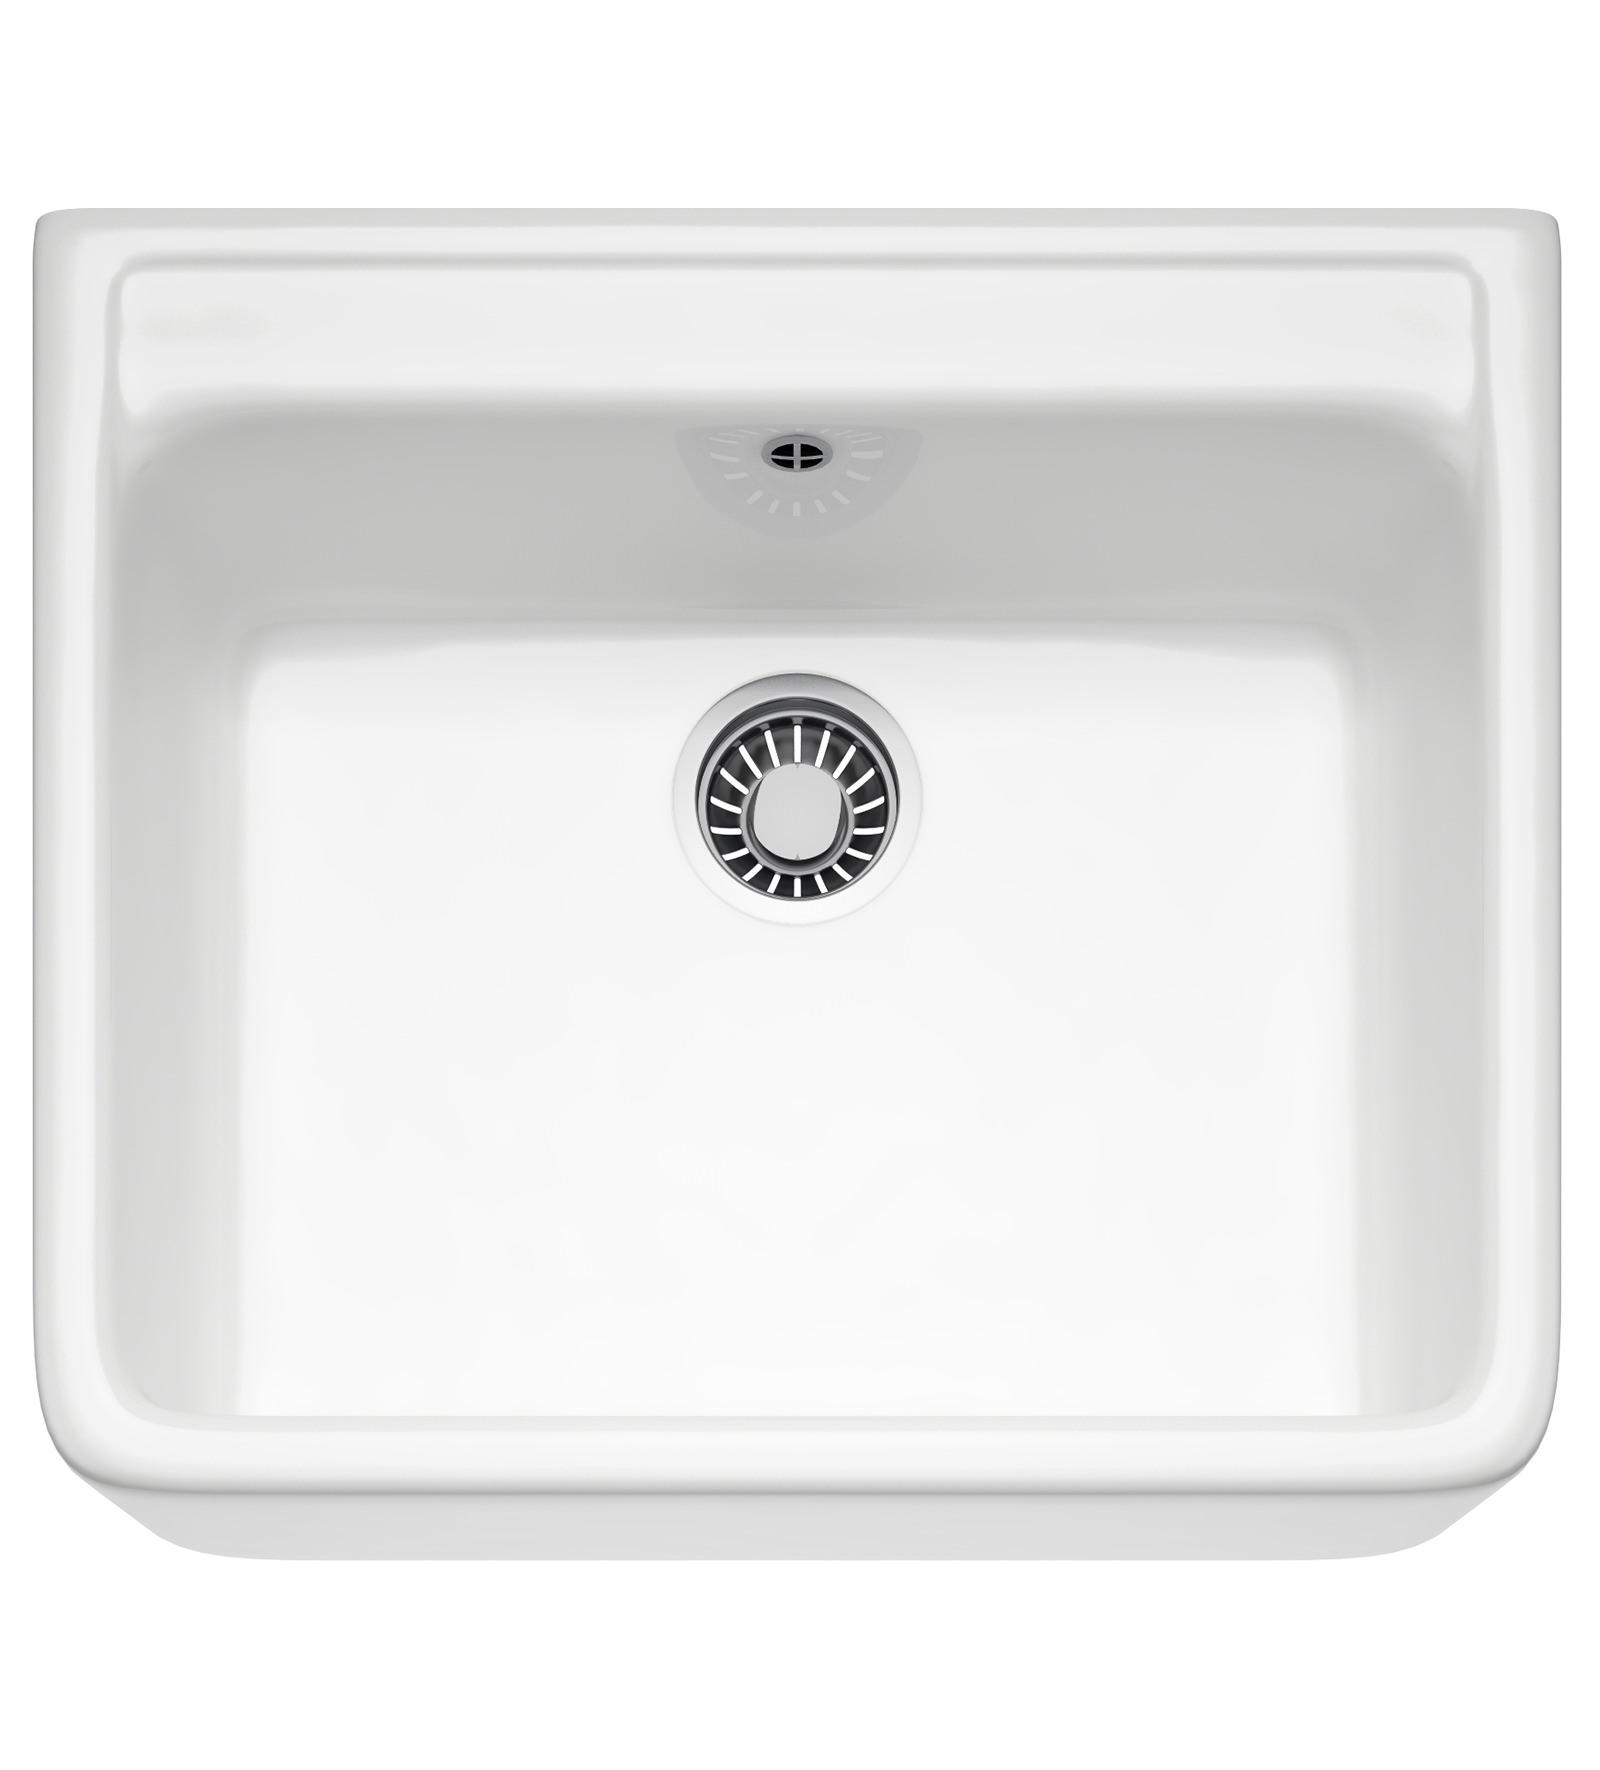 franke belfast vbk 710 ceramic white 1.0 bowl kitchen sink